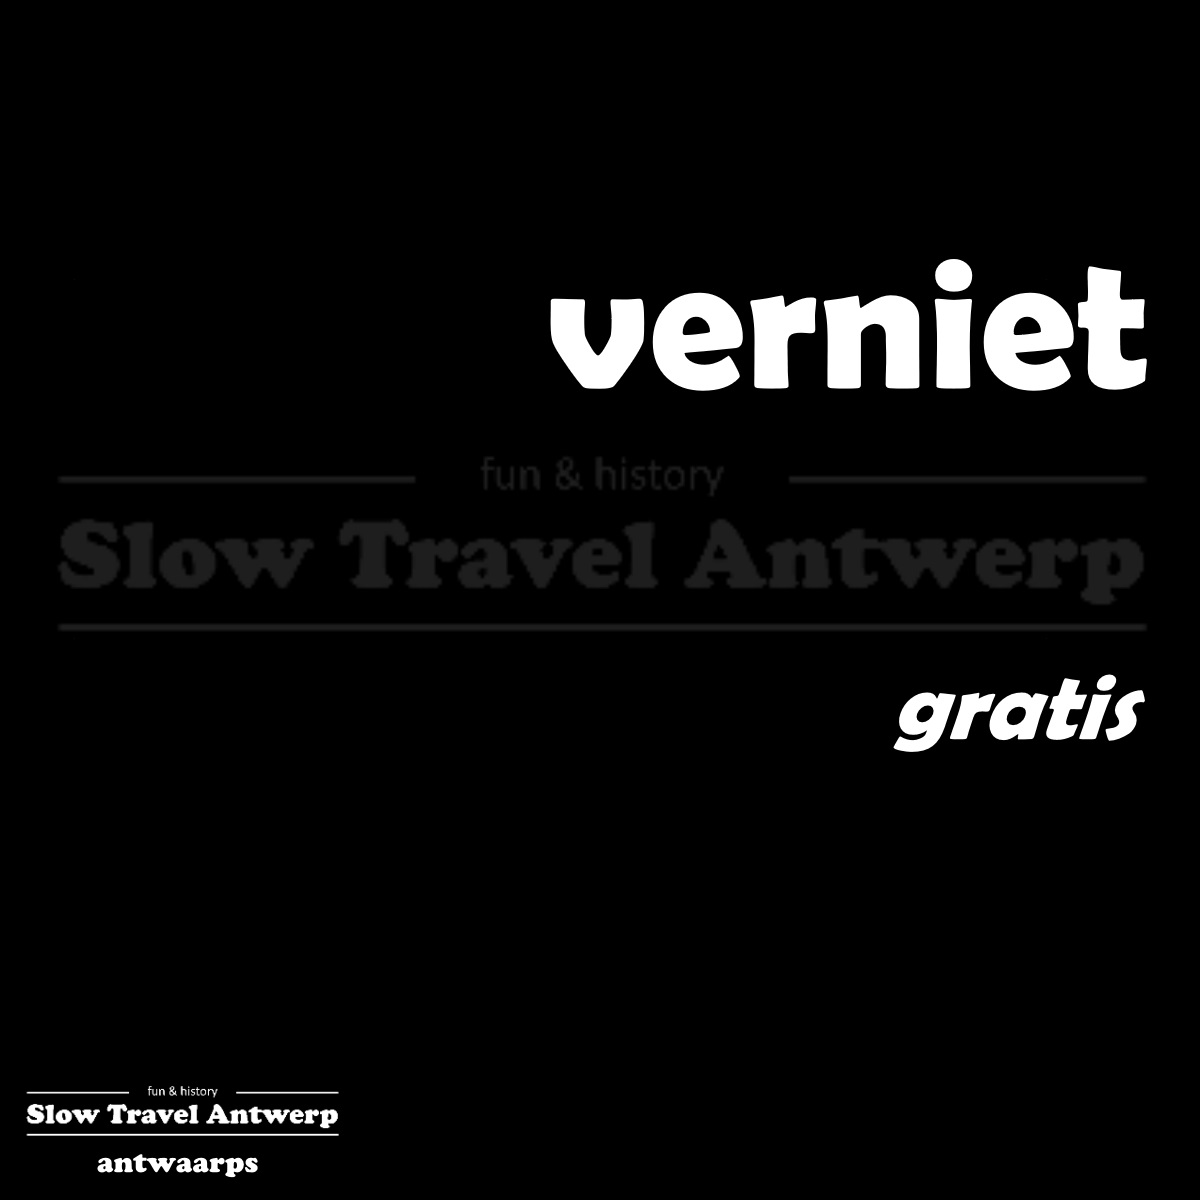 verniet – gratis – free